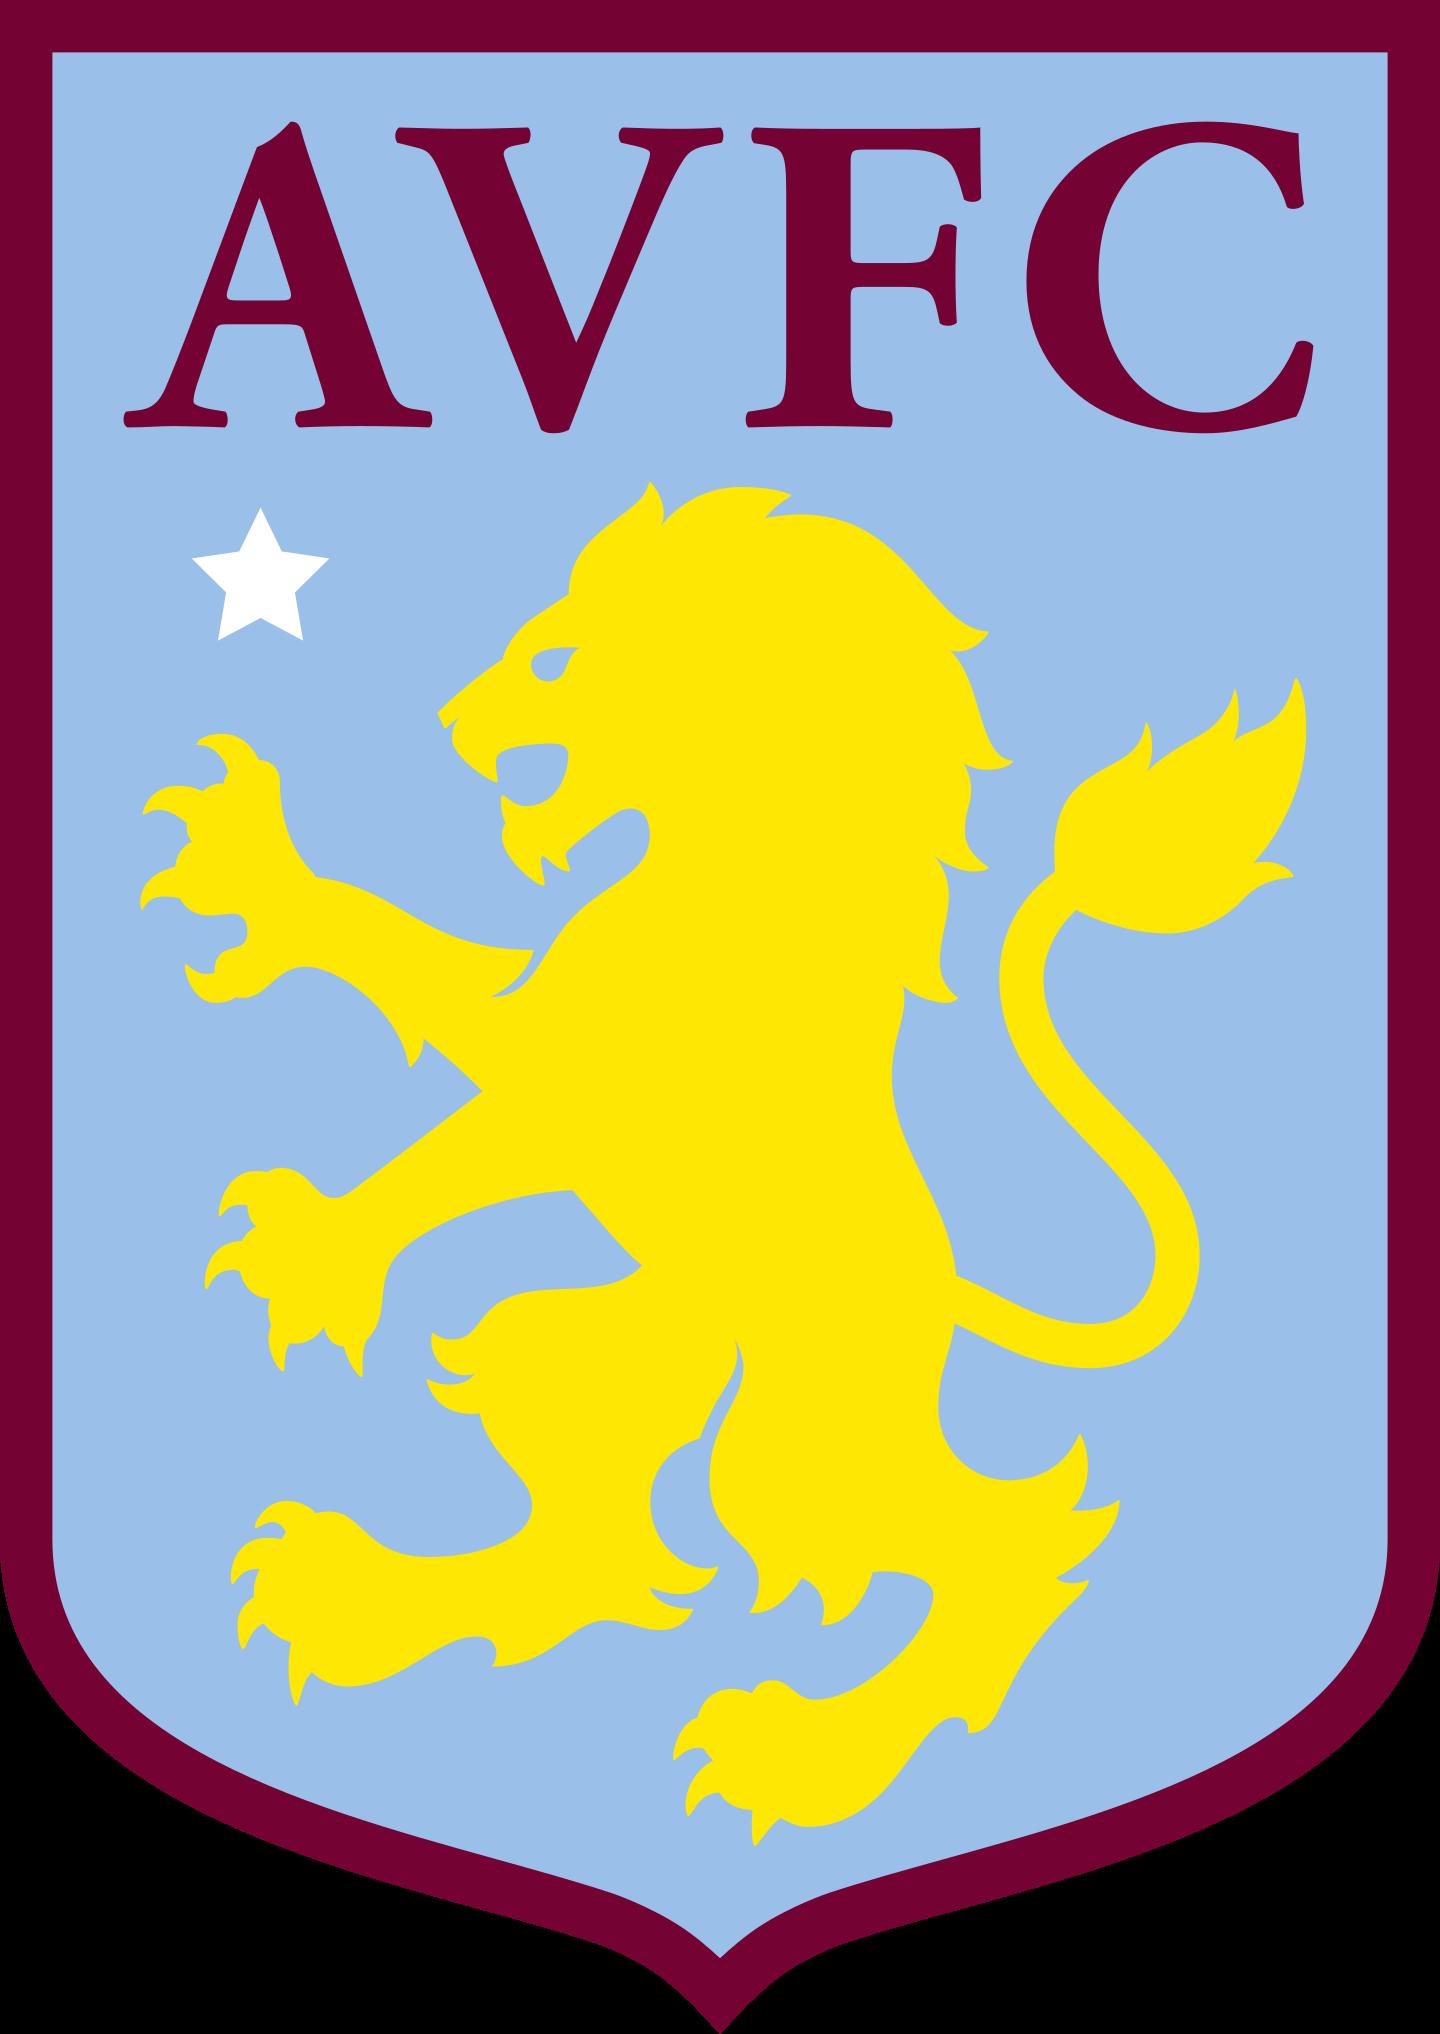 aston villa logo 2 - Aston Villa FC Logo